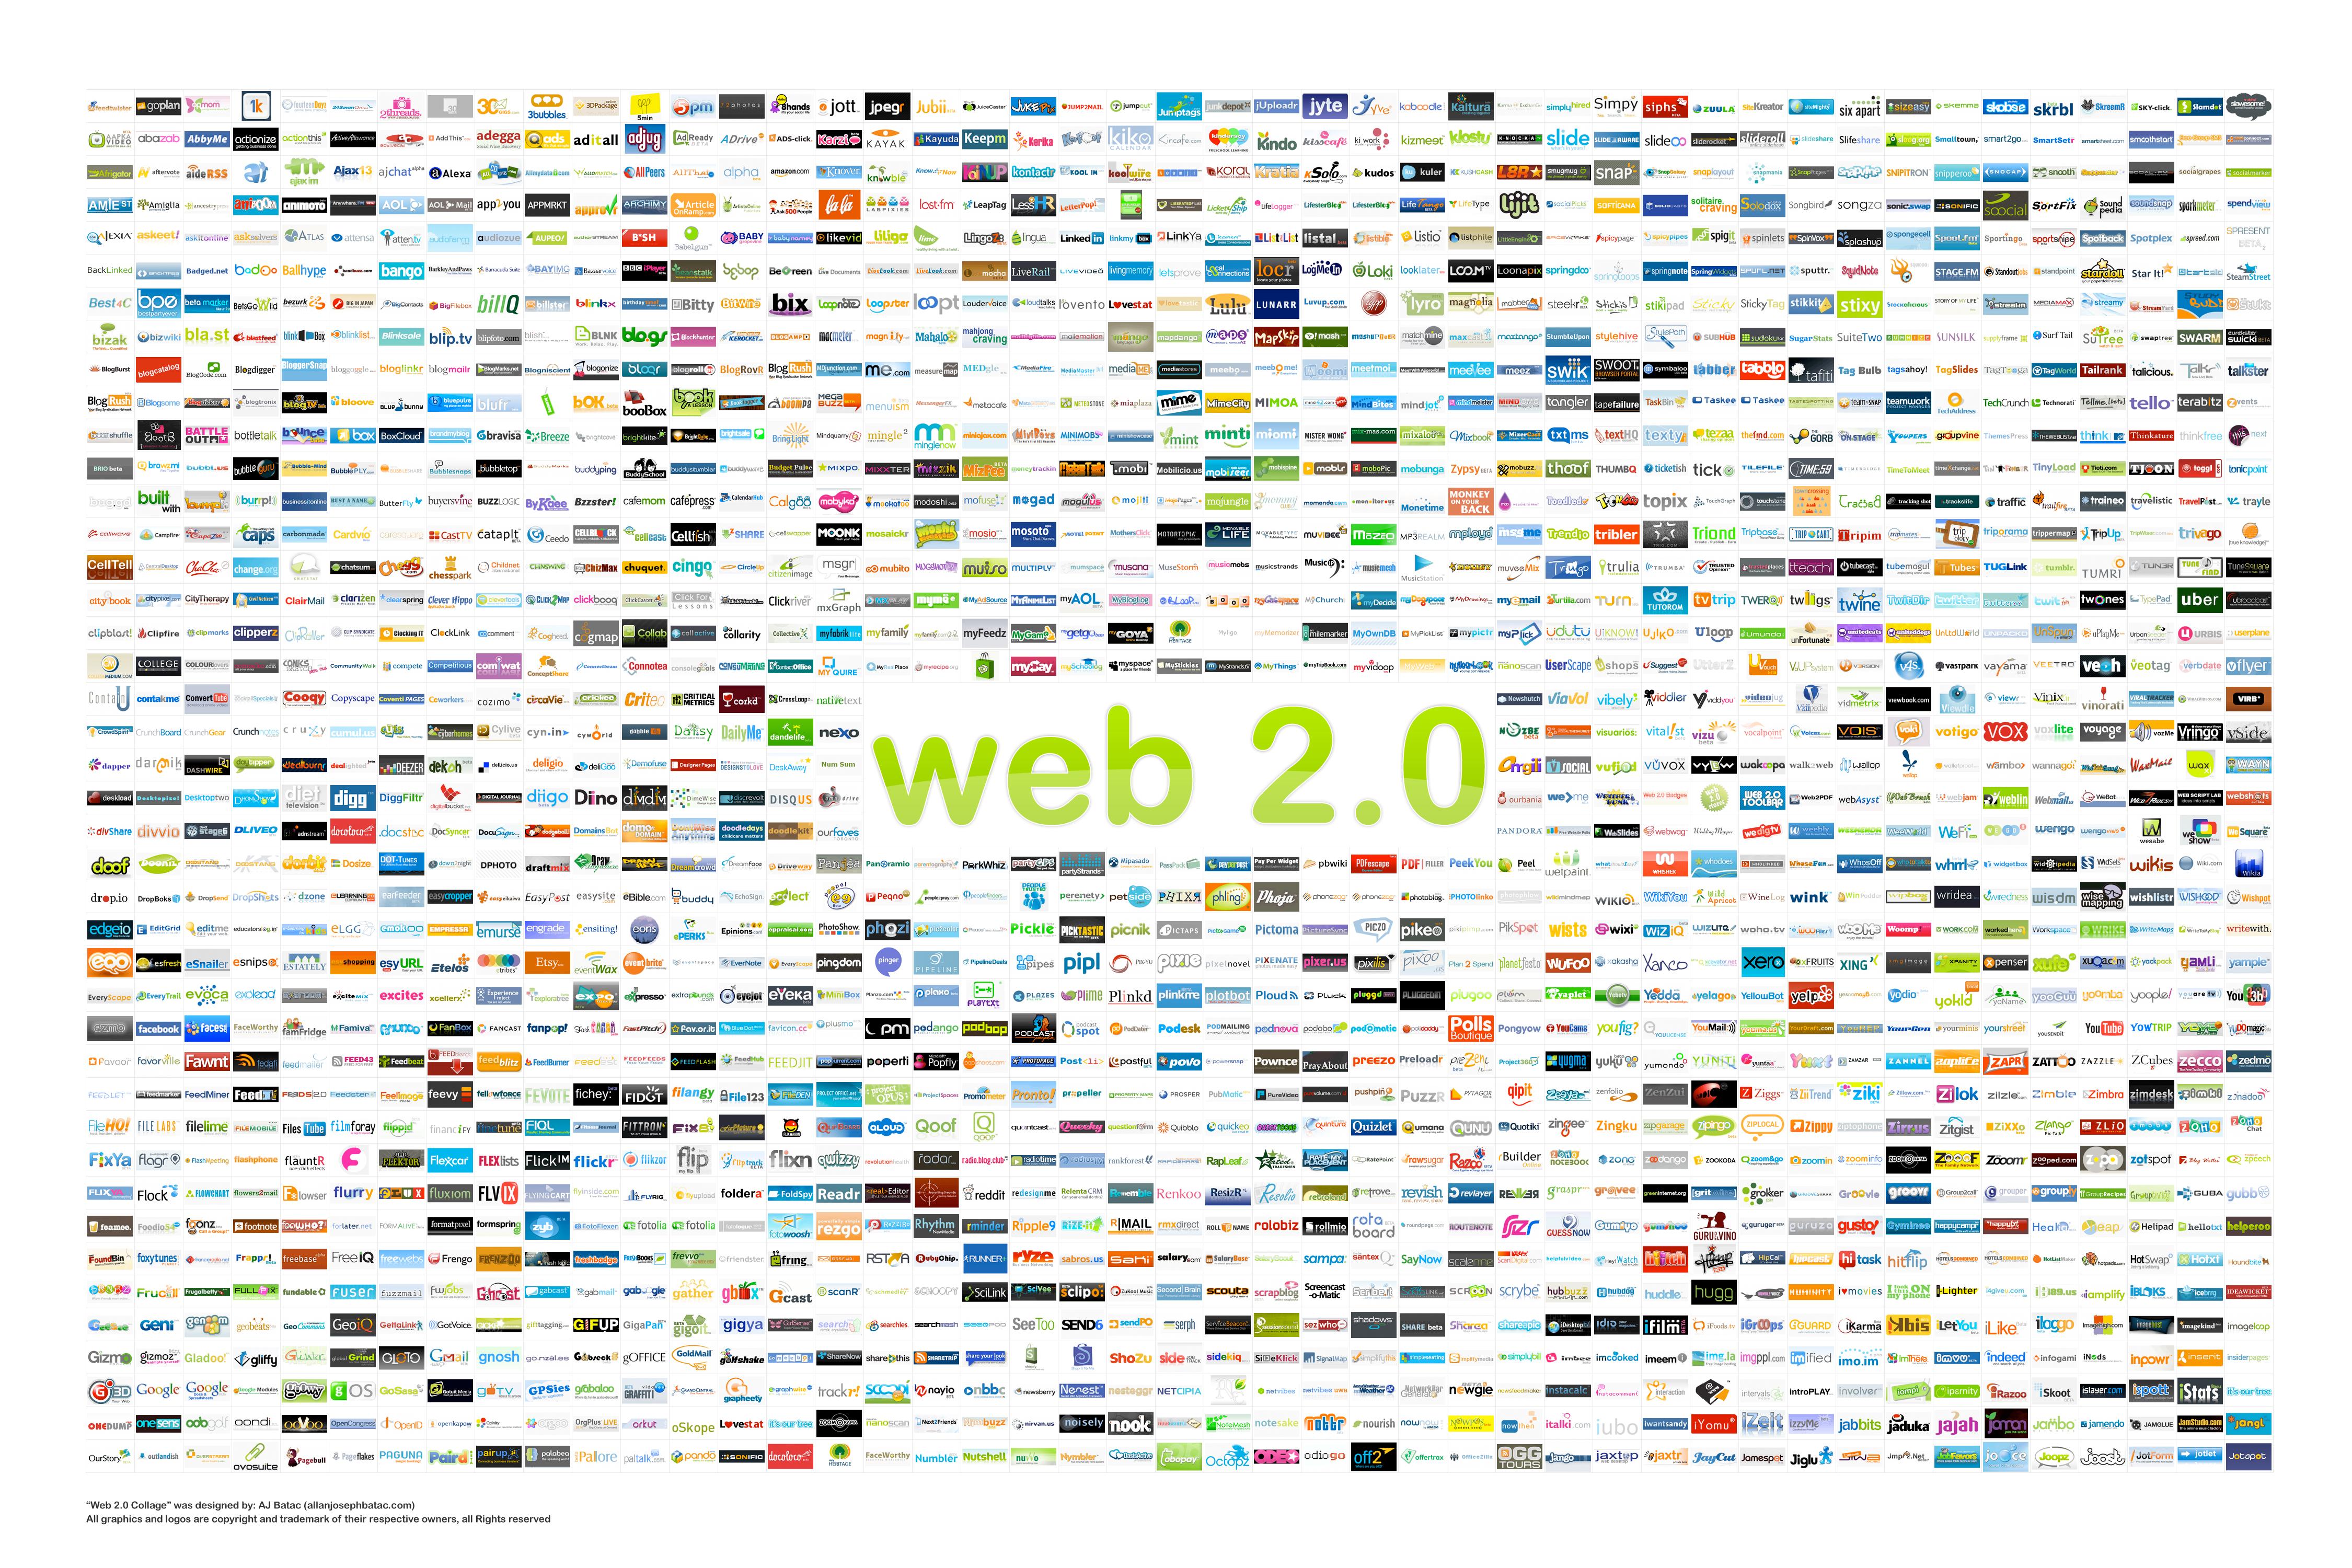 Social Media / Social Networks / Wikis Timeline